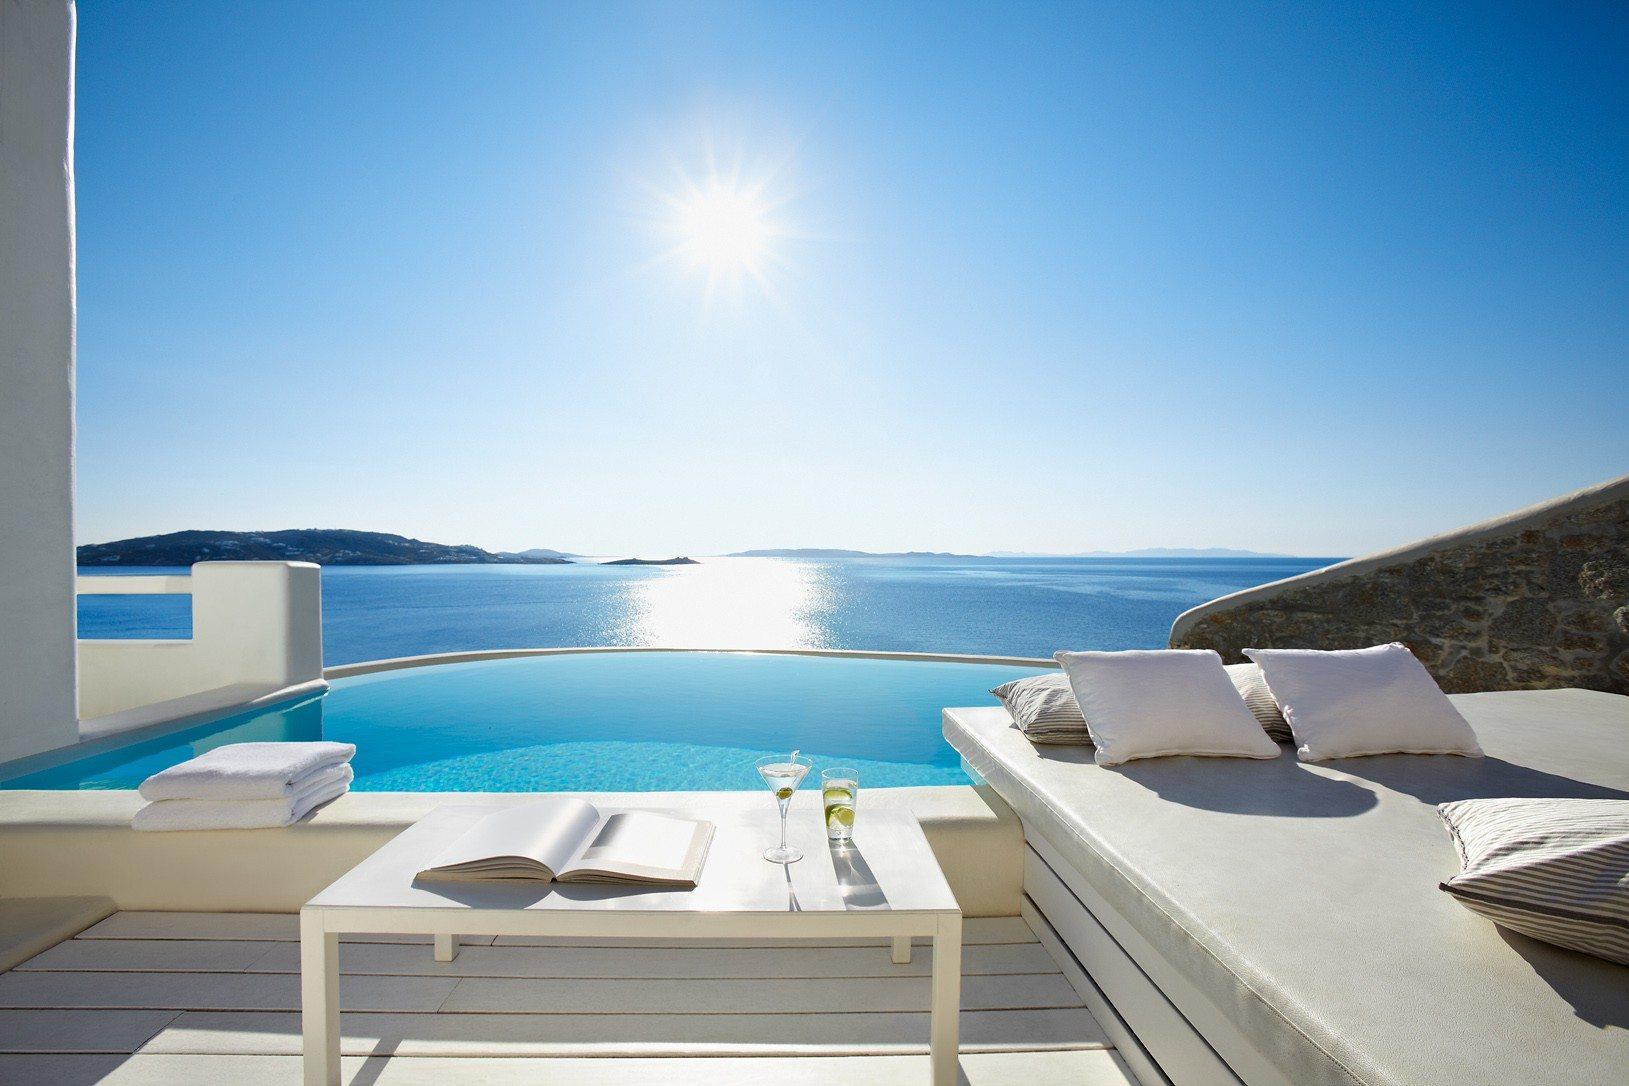 Cavo tagoo hotel greece infinity pools for Pool design company radom polen